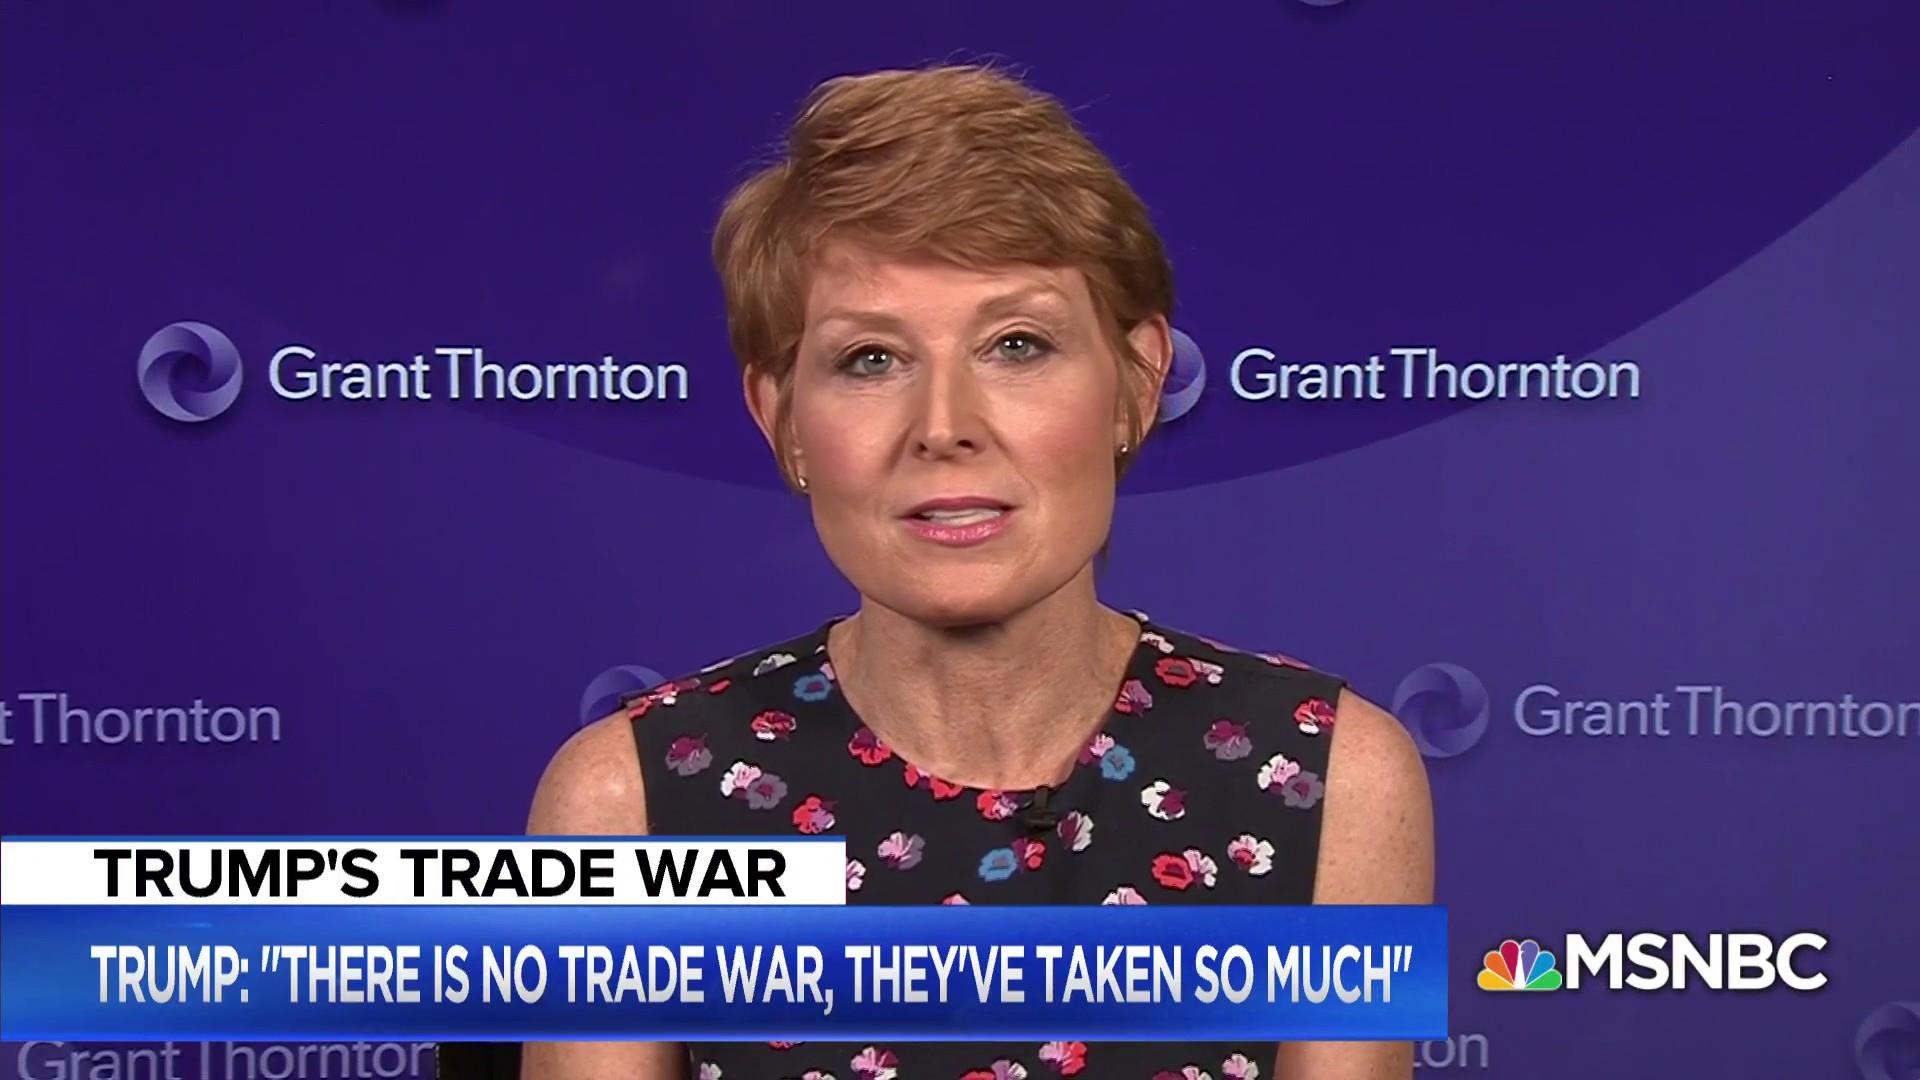 U.S. vs. China: The impact of Trump's trade war